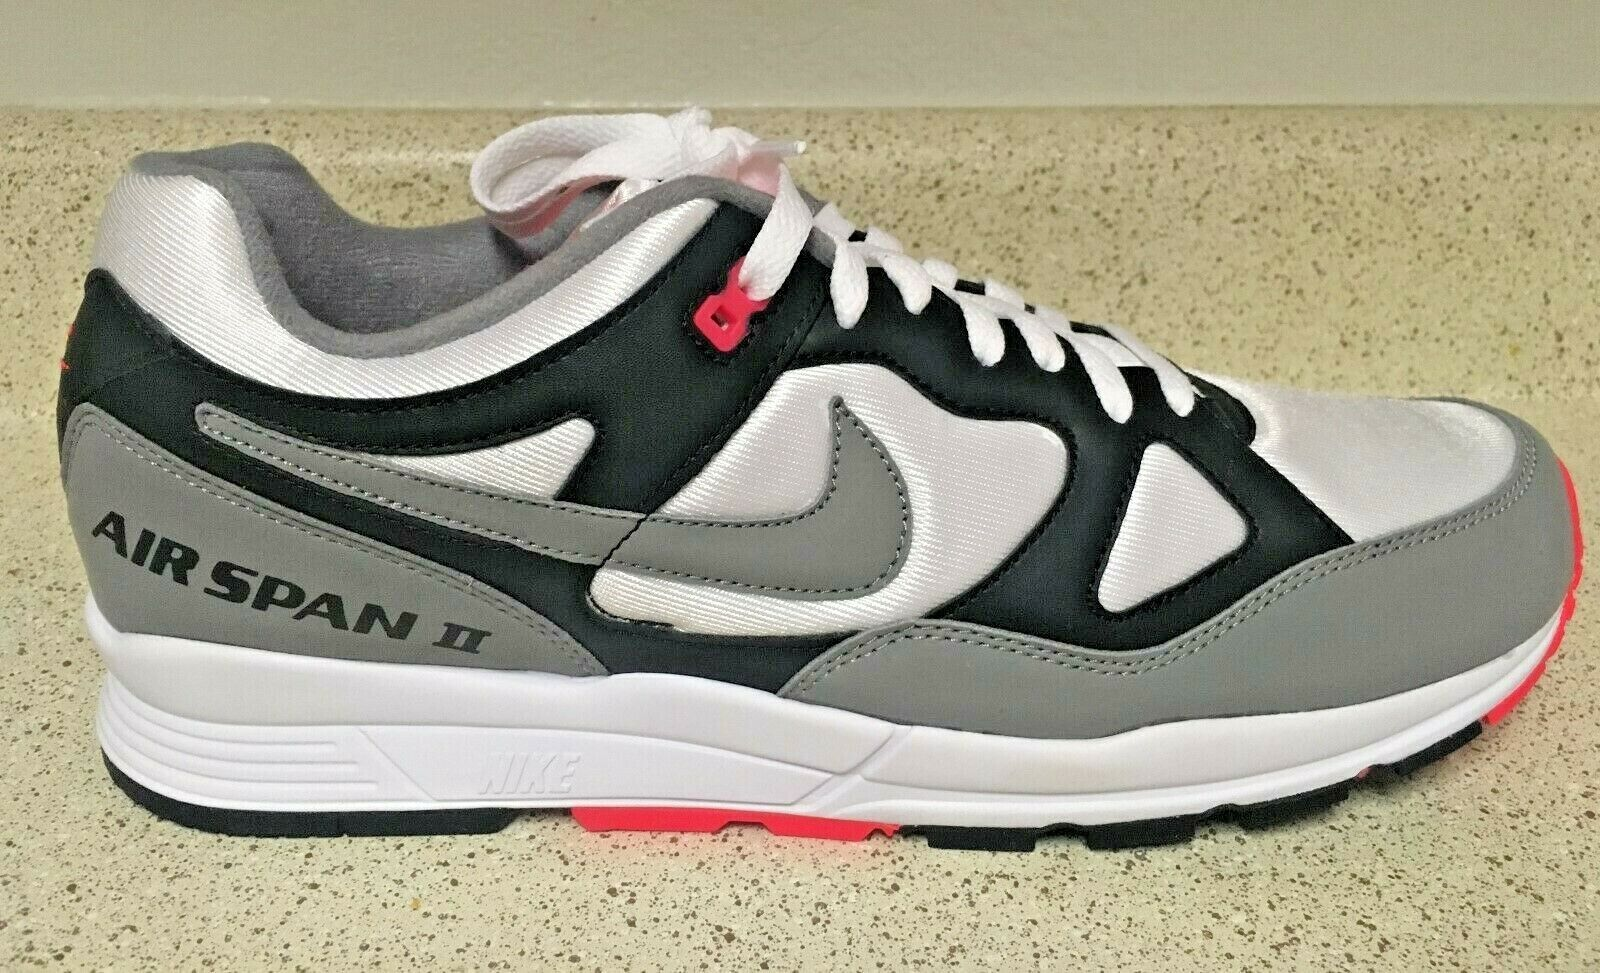 Nike Air Span II Hot Punch Coral Solar Red Dust {AH8047-005} Mens Sz 9.5